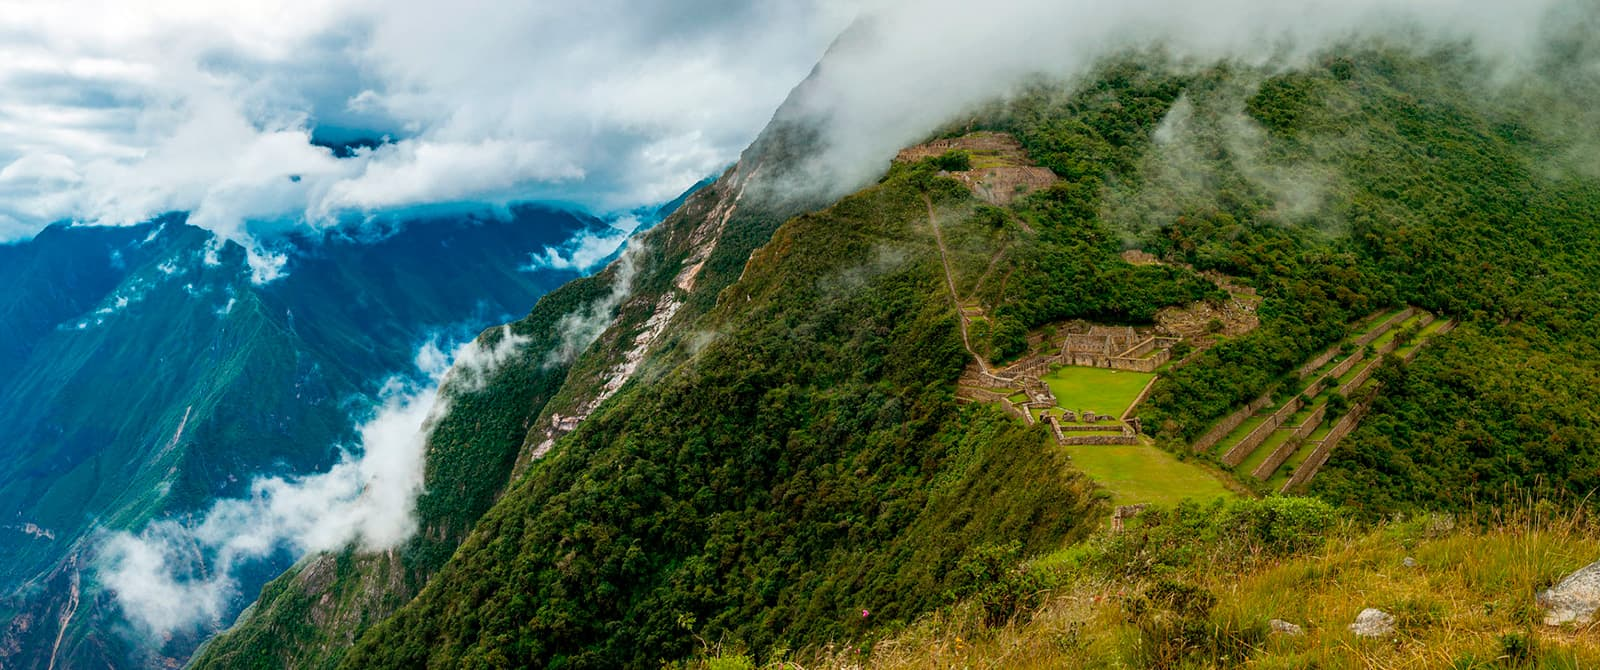 choquequirao trek with kaypi peru